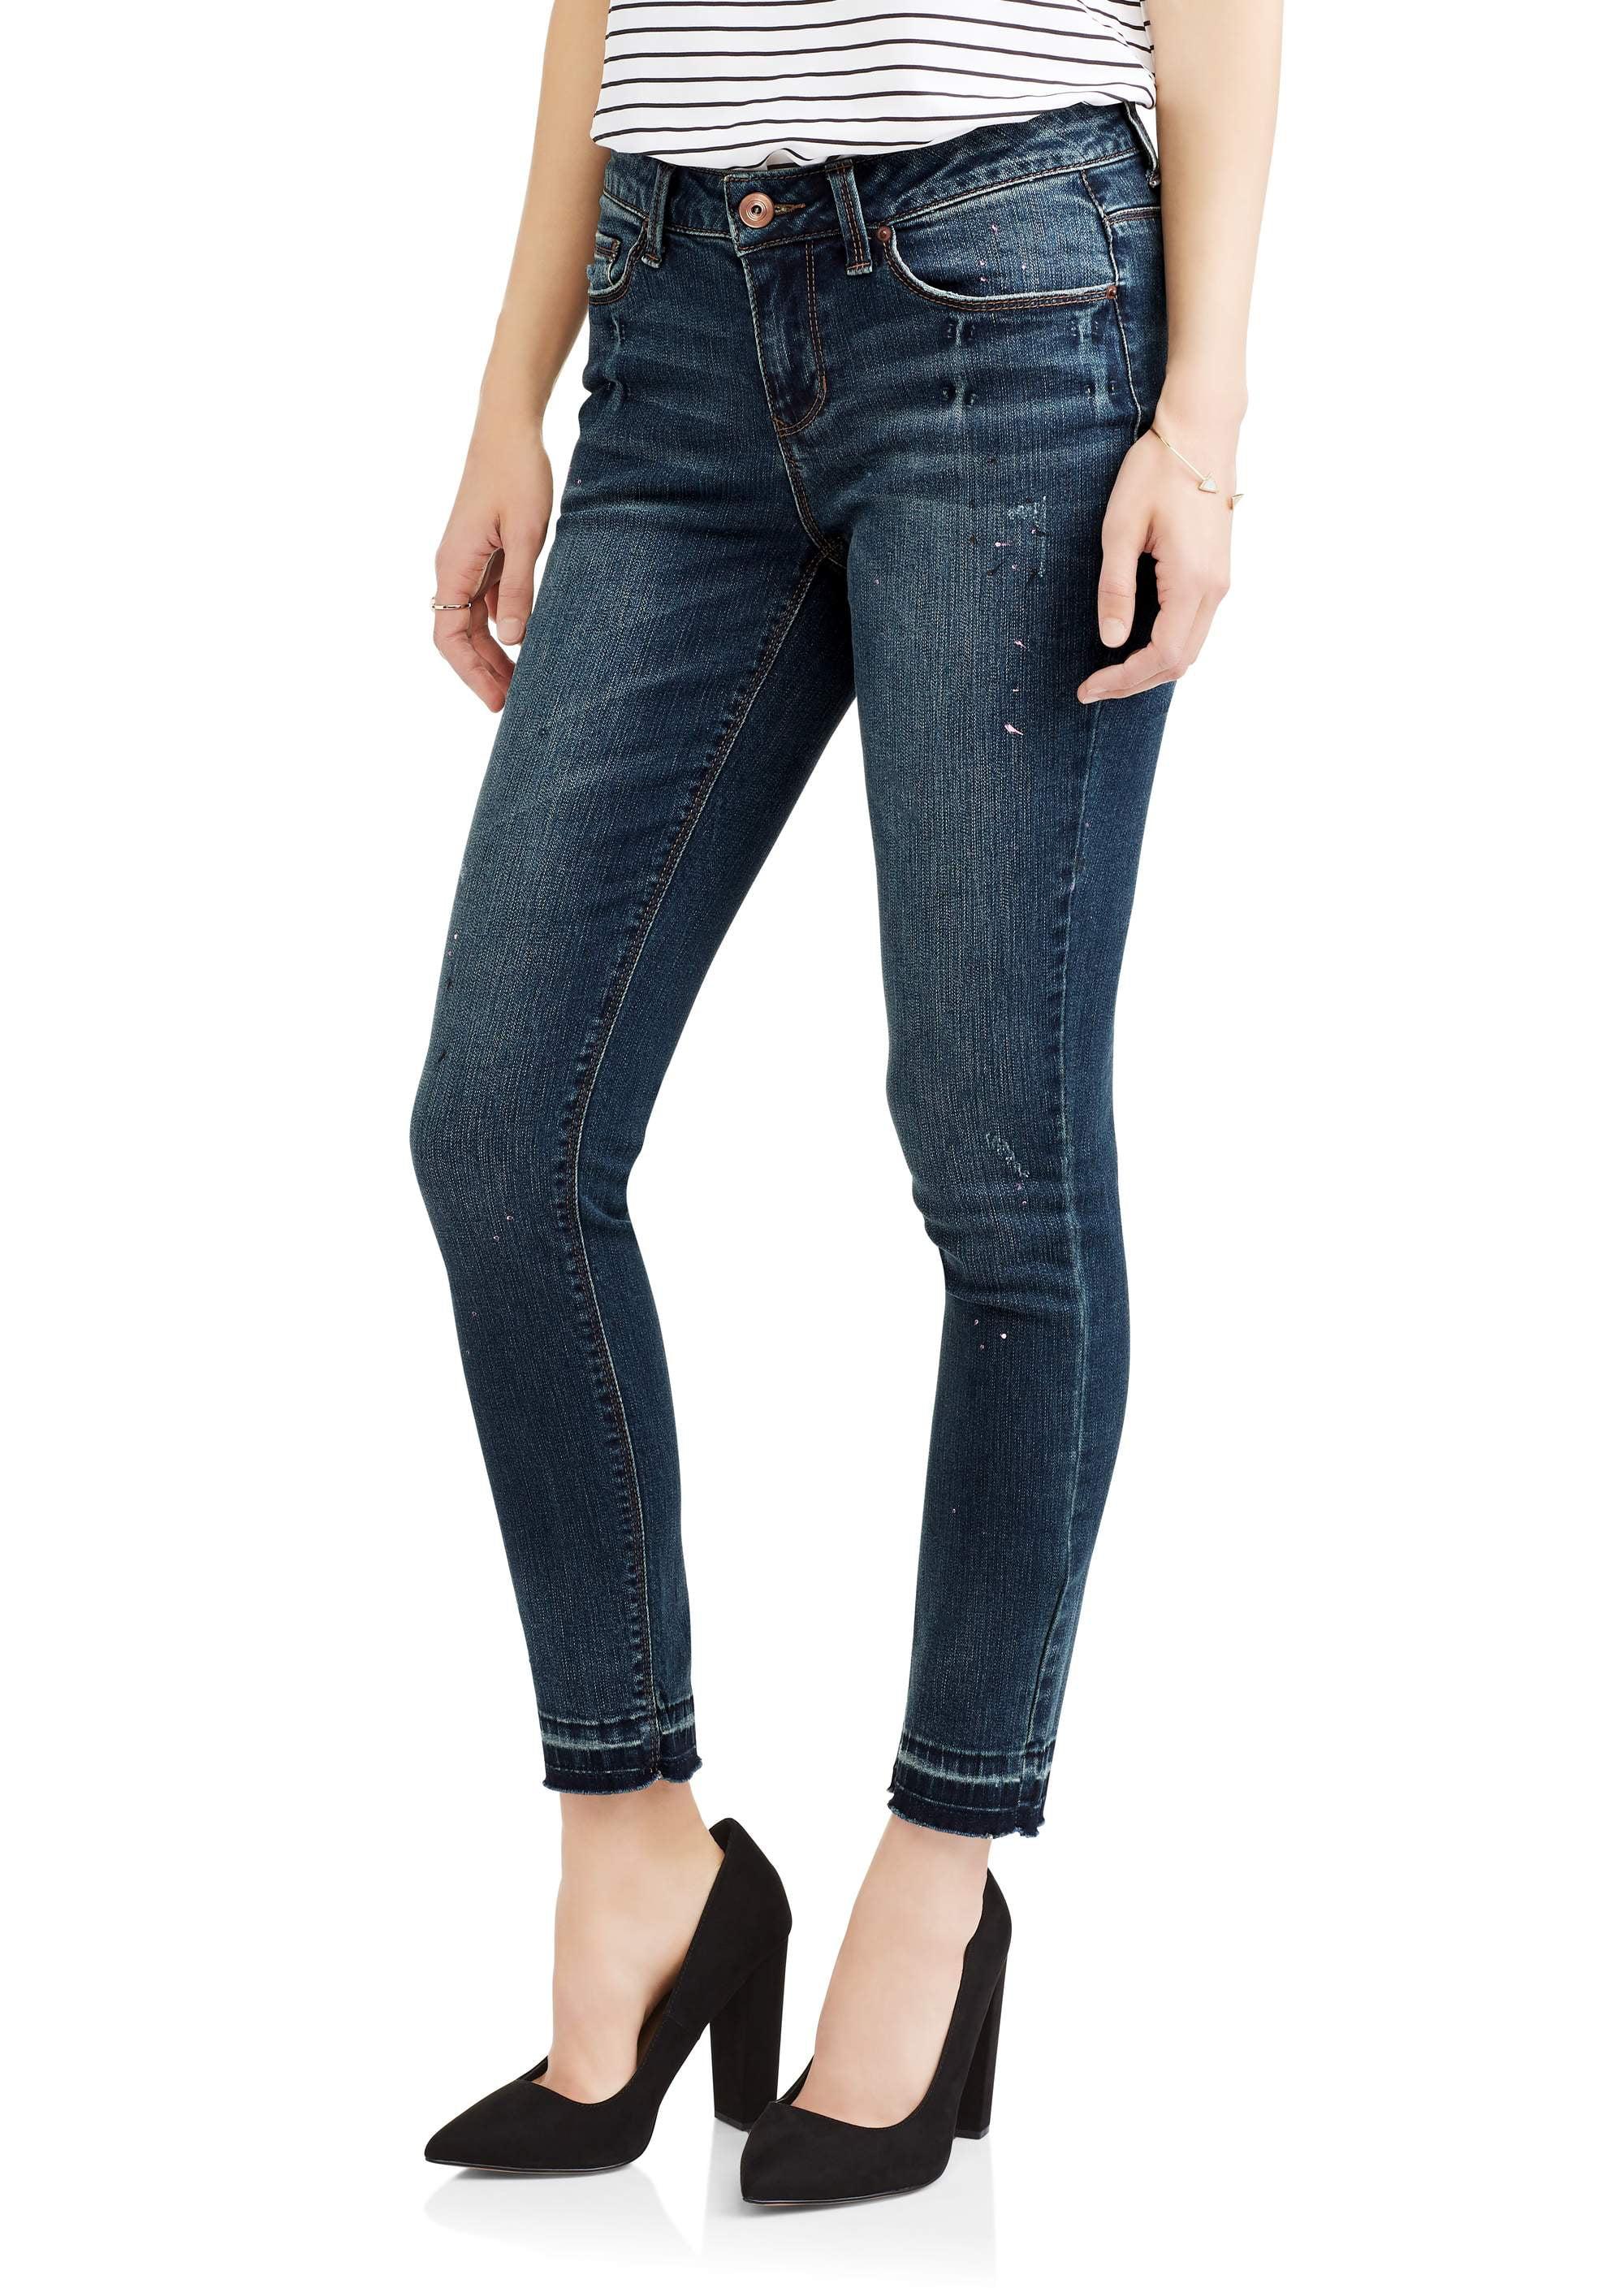 Faded Glory Women's Paint Splattered Skinny Jeans with Release Hem